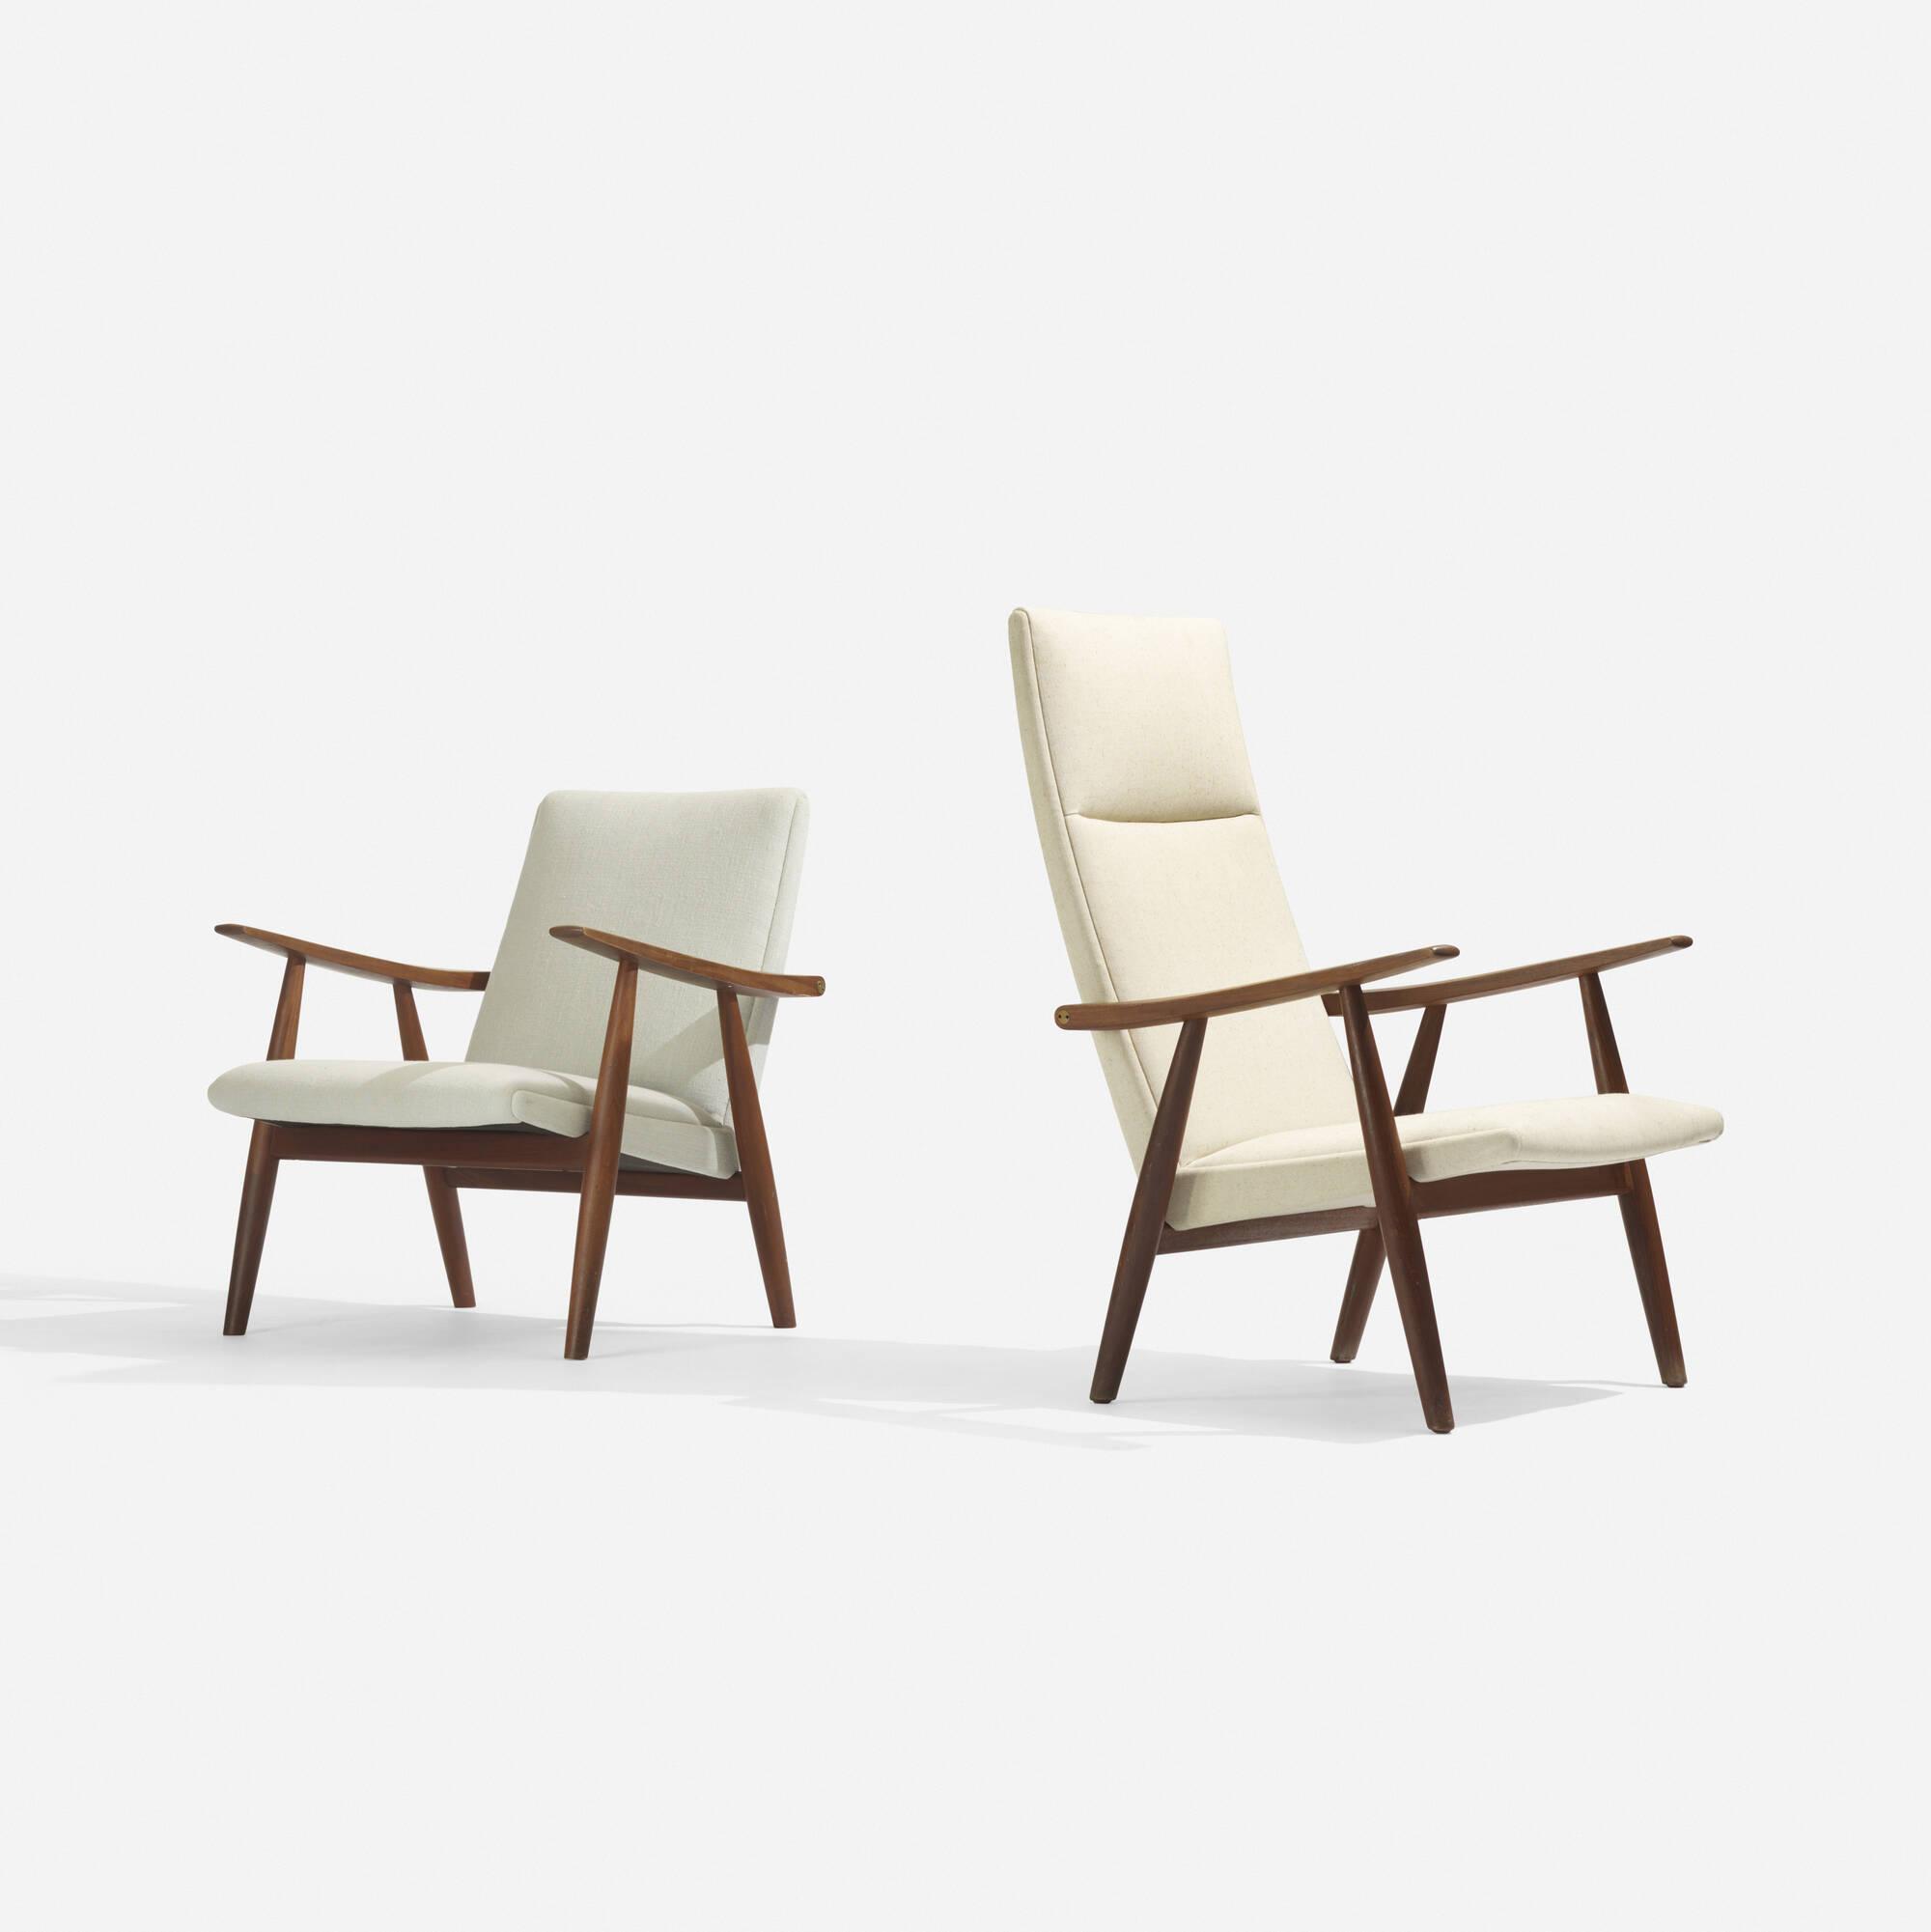 264: Hans J. Wegner / Lounge Chair, Model GE260 And Lounge Chair,